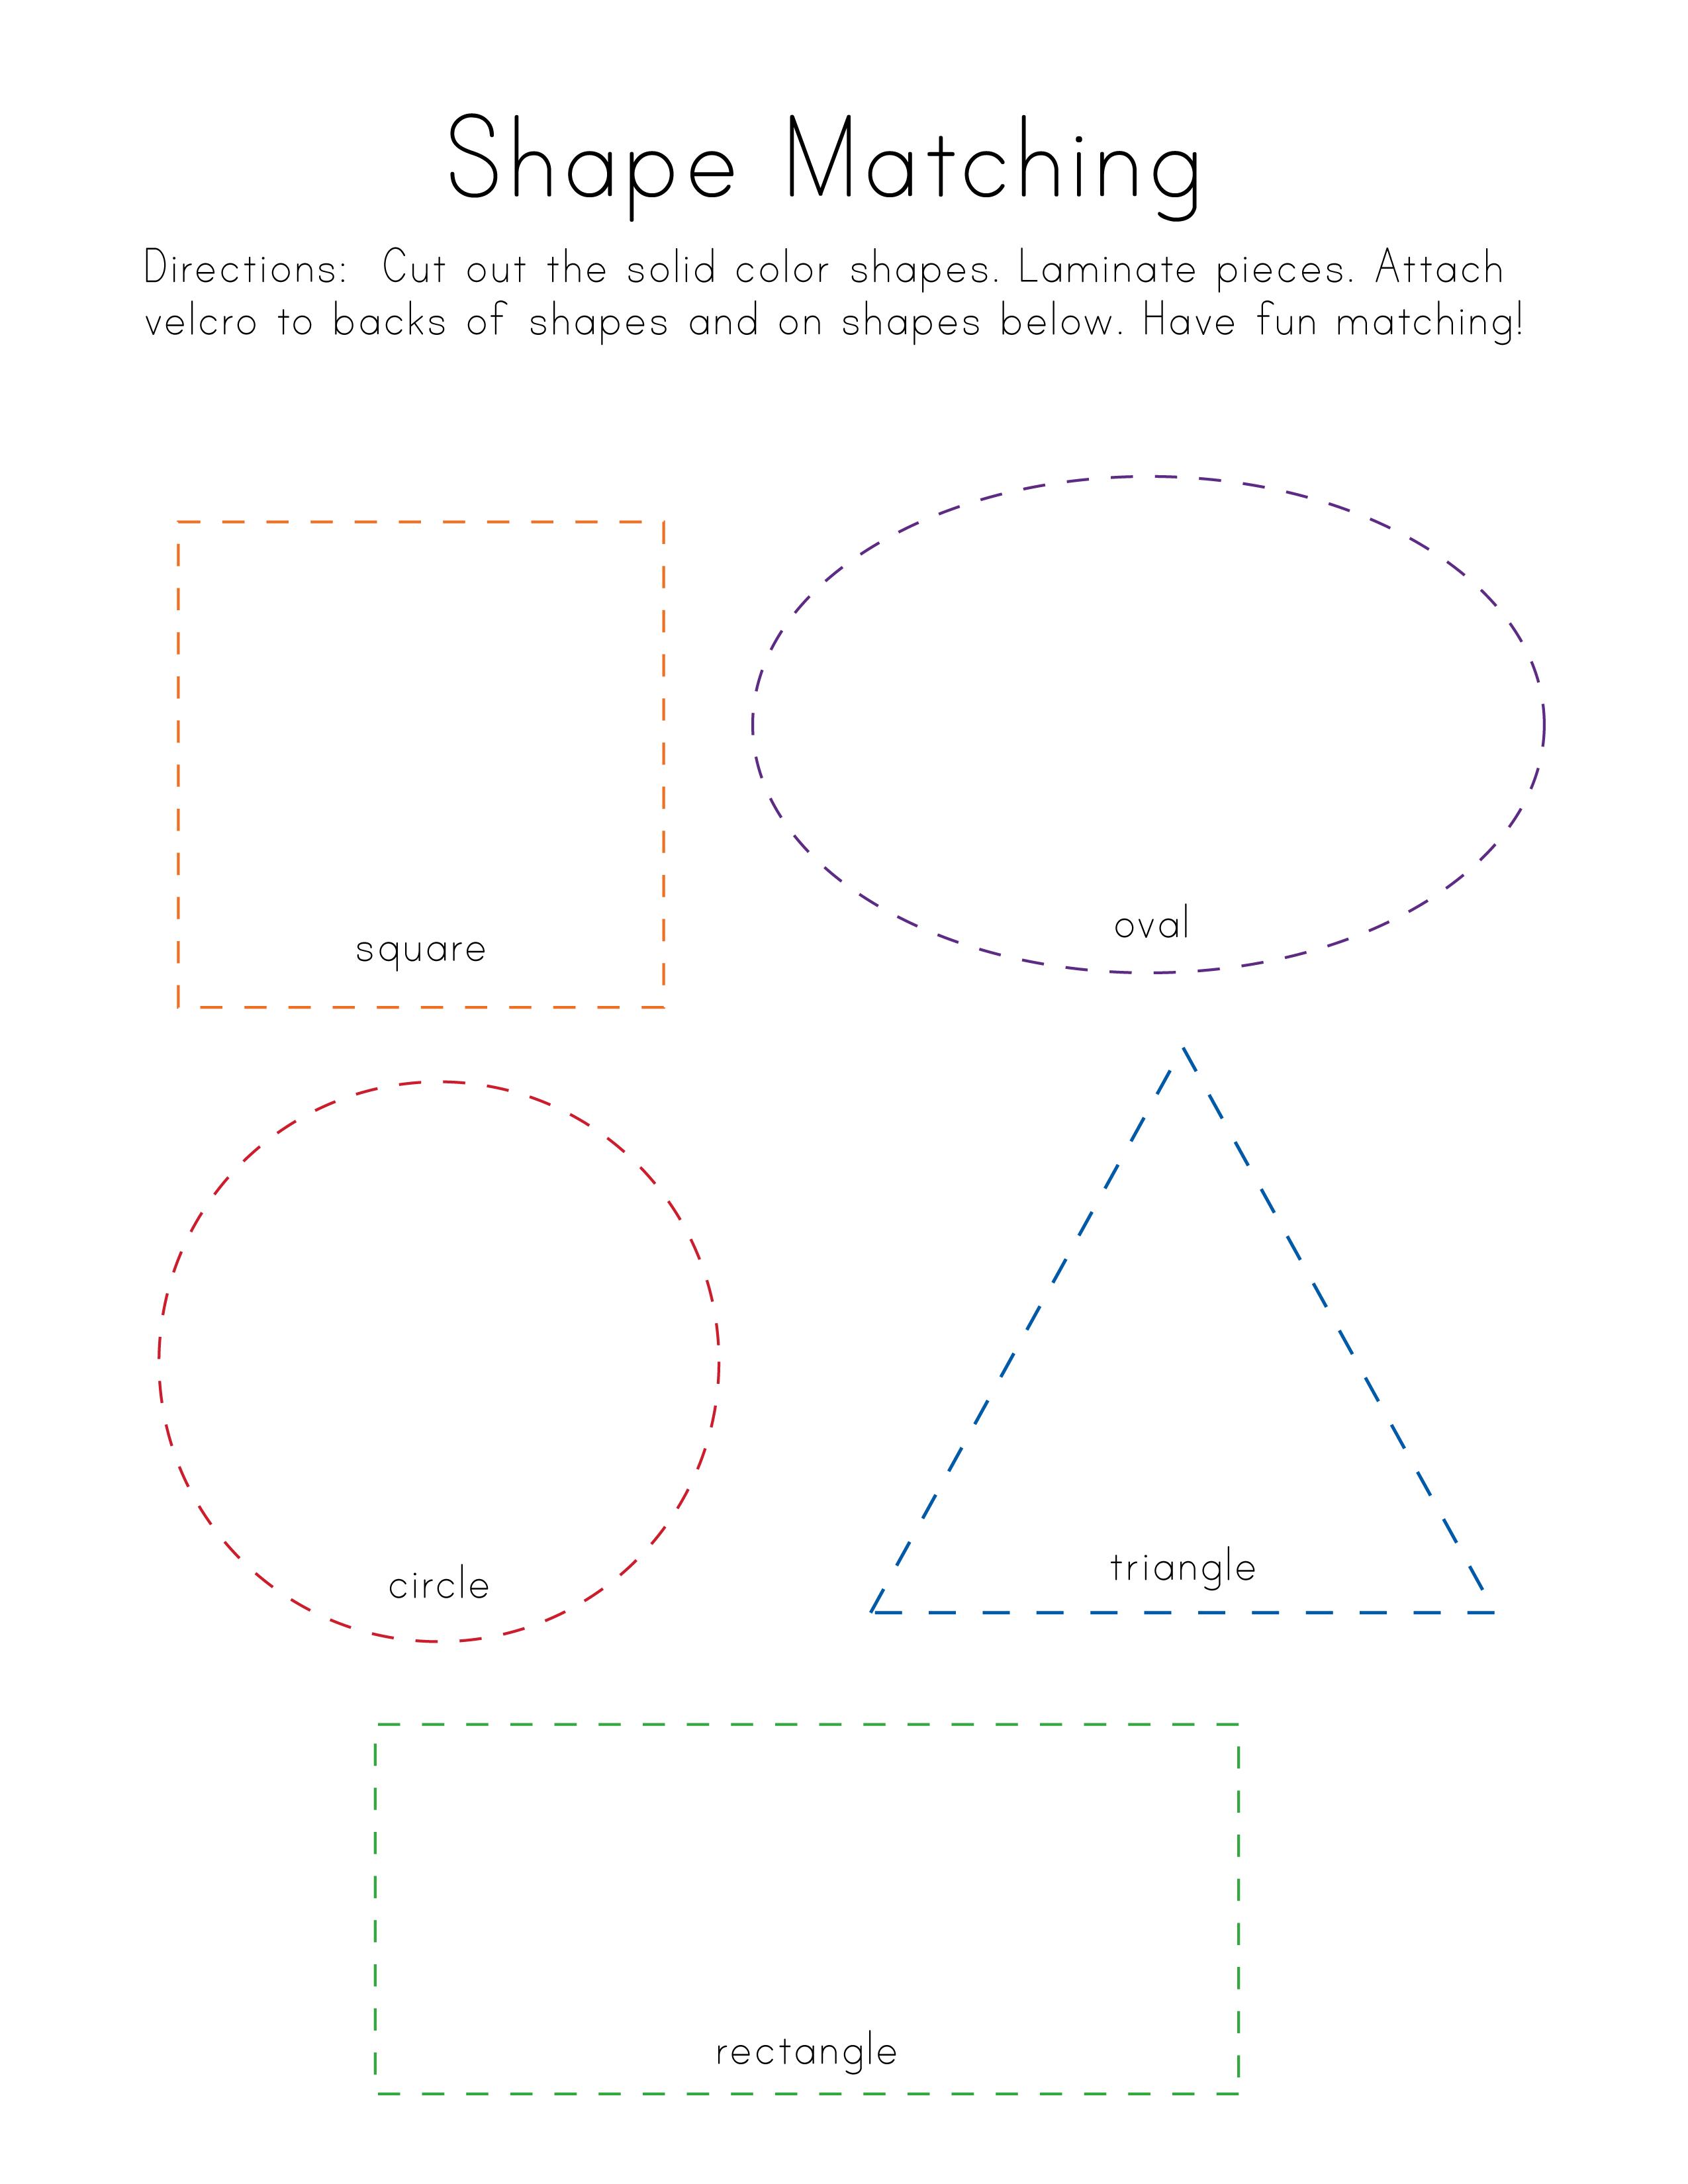 Shape Matching Free Printable